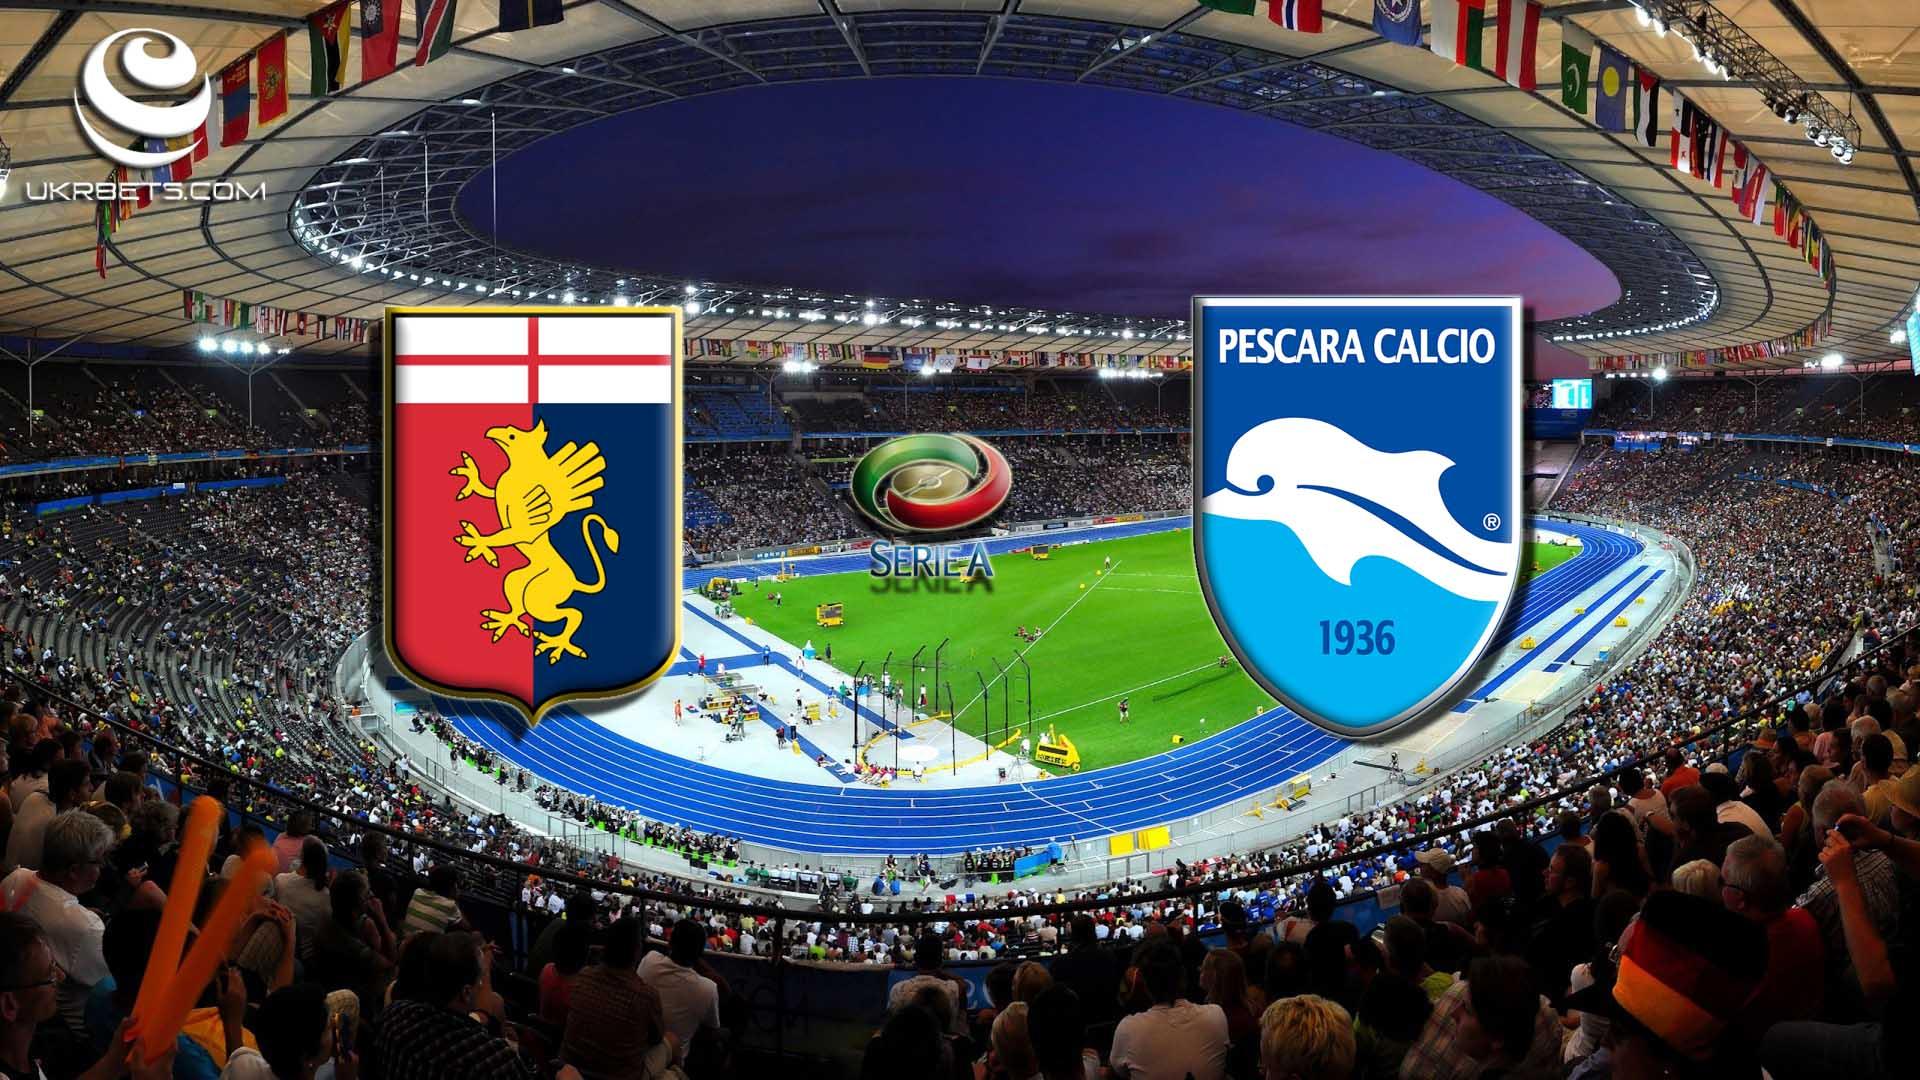 Прогноз на матч Дженоа - Пескара 25 сентября 2016